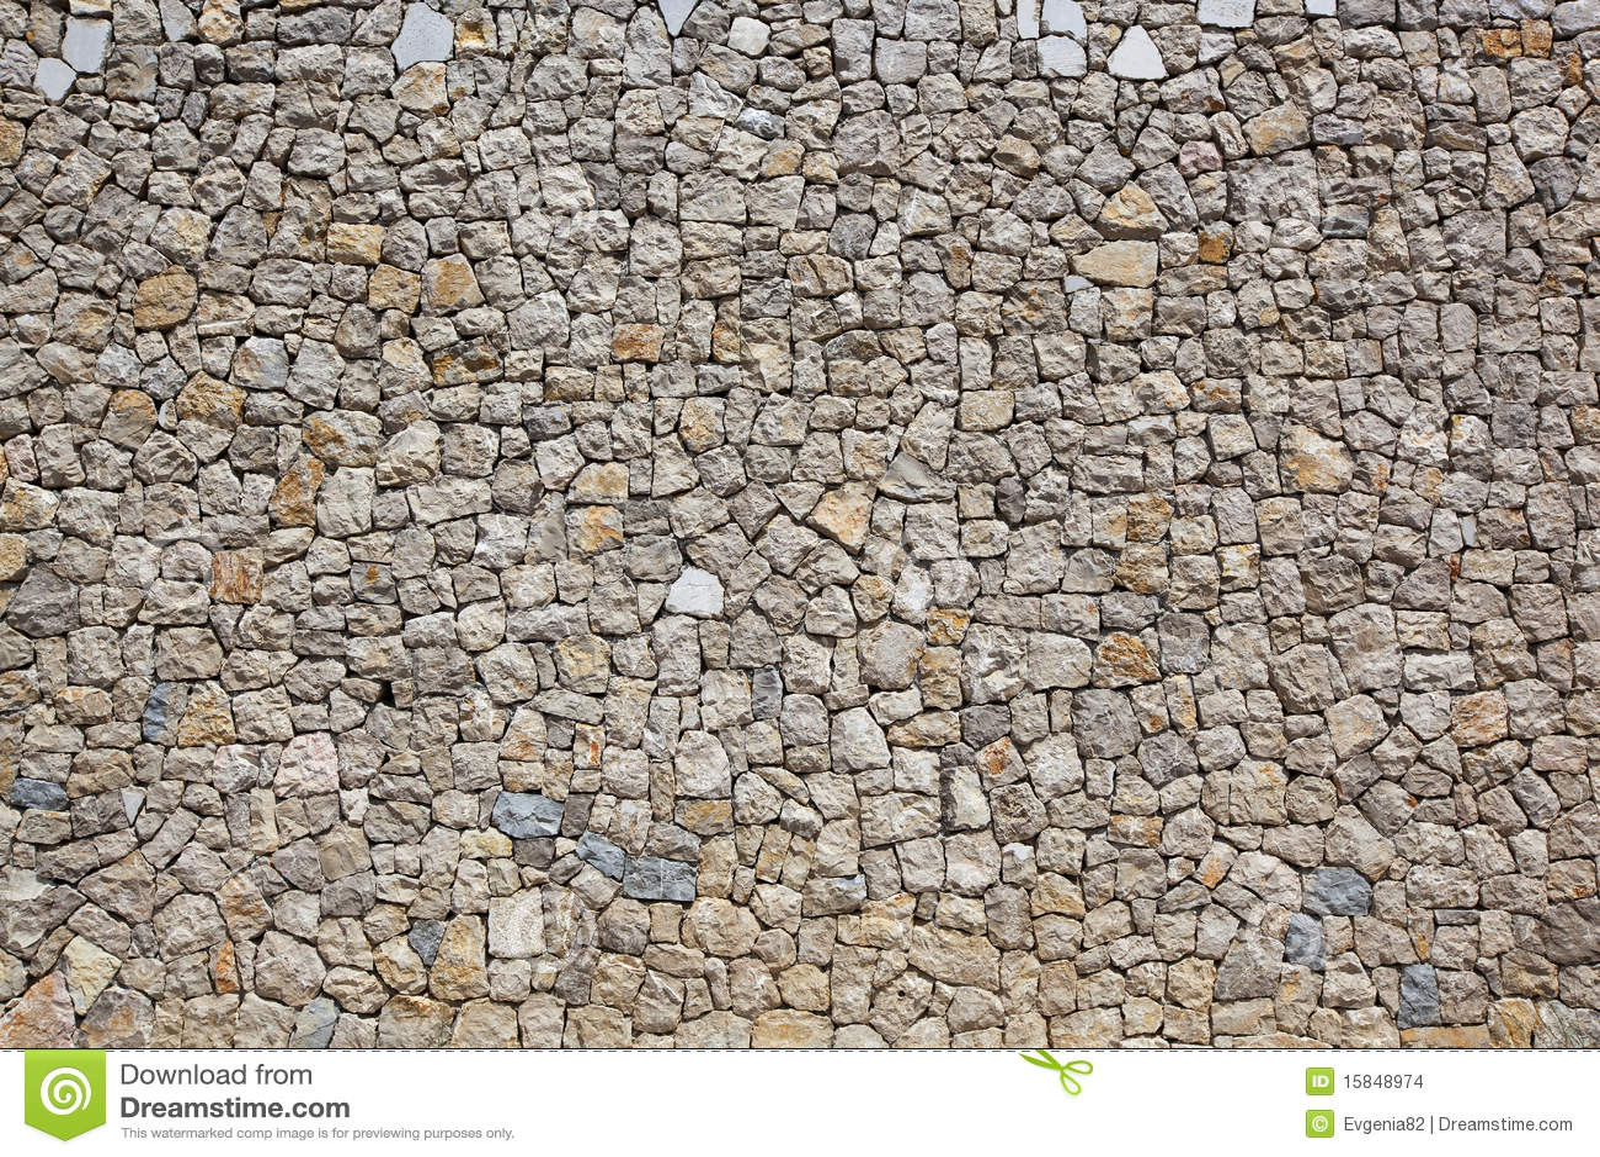 Stone cladding internal walls texture seamless 08112 |Cobblestone Wall